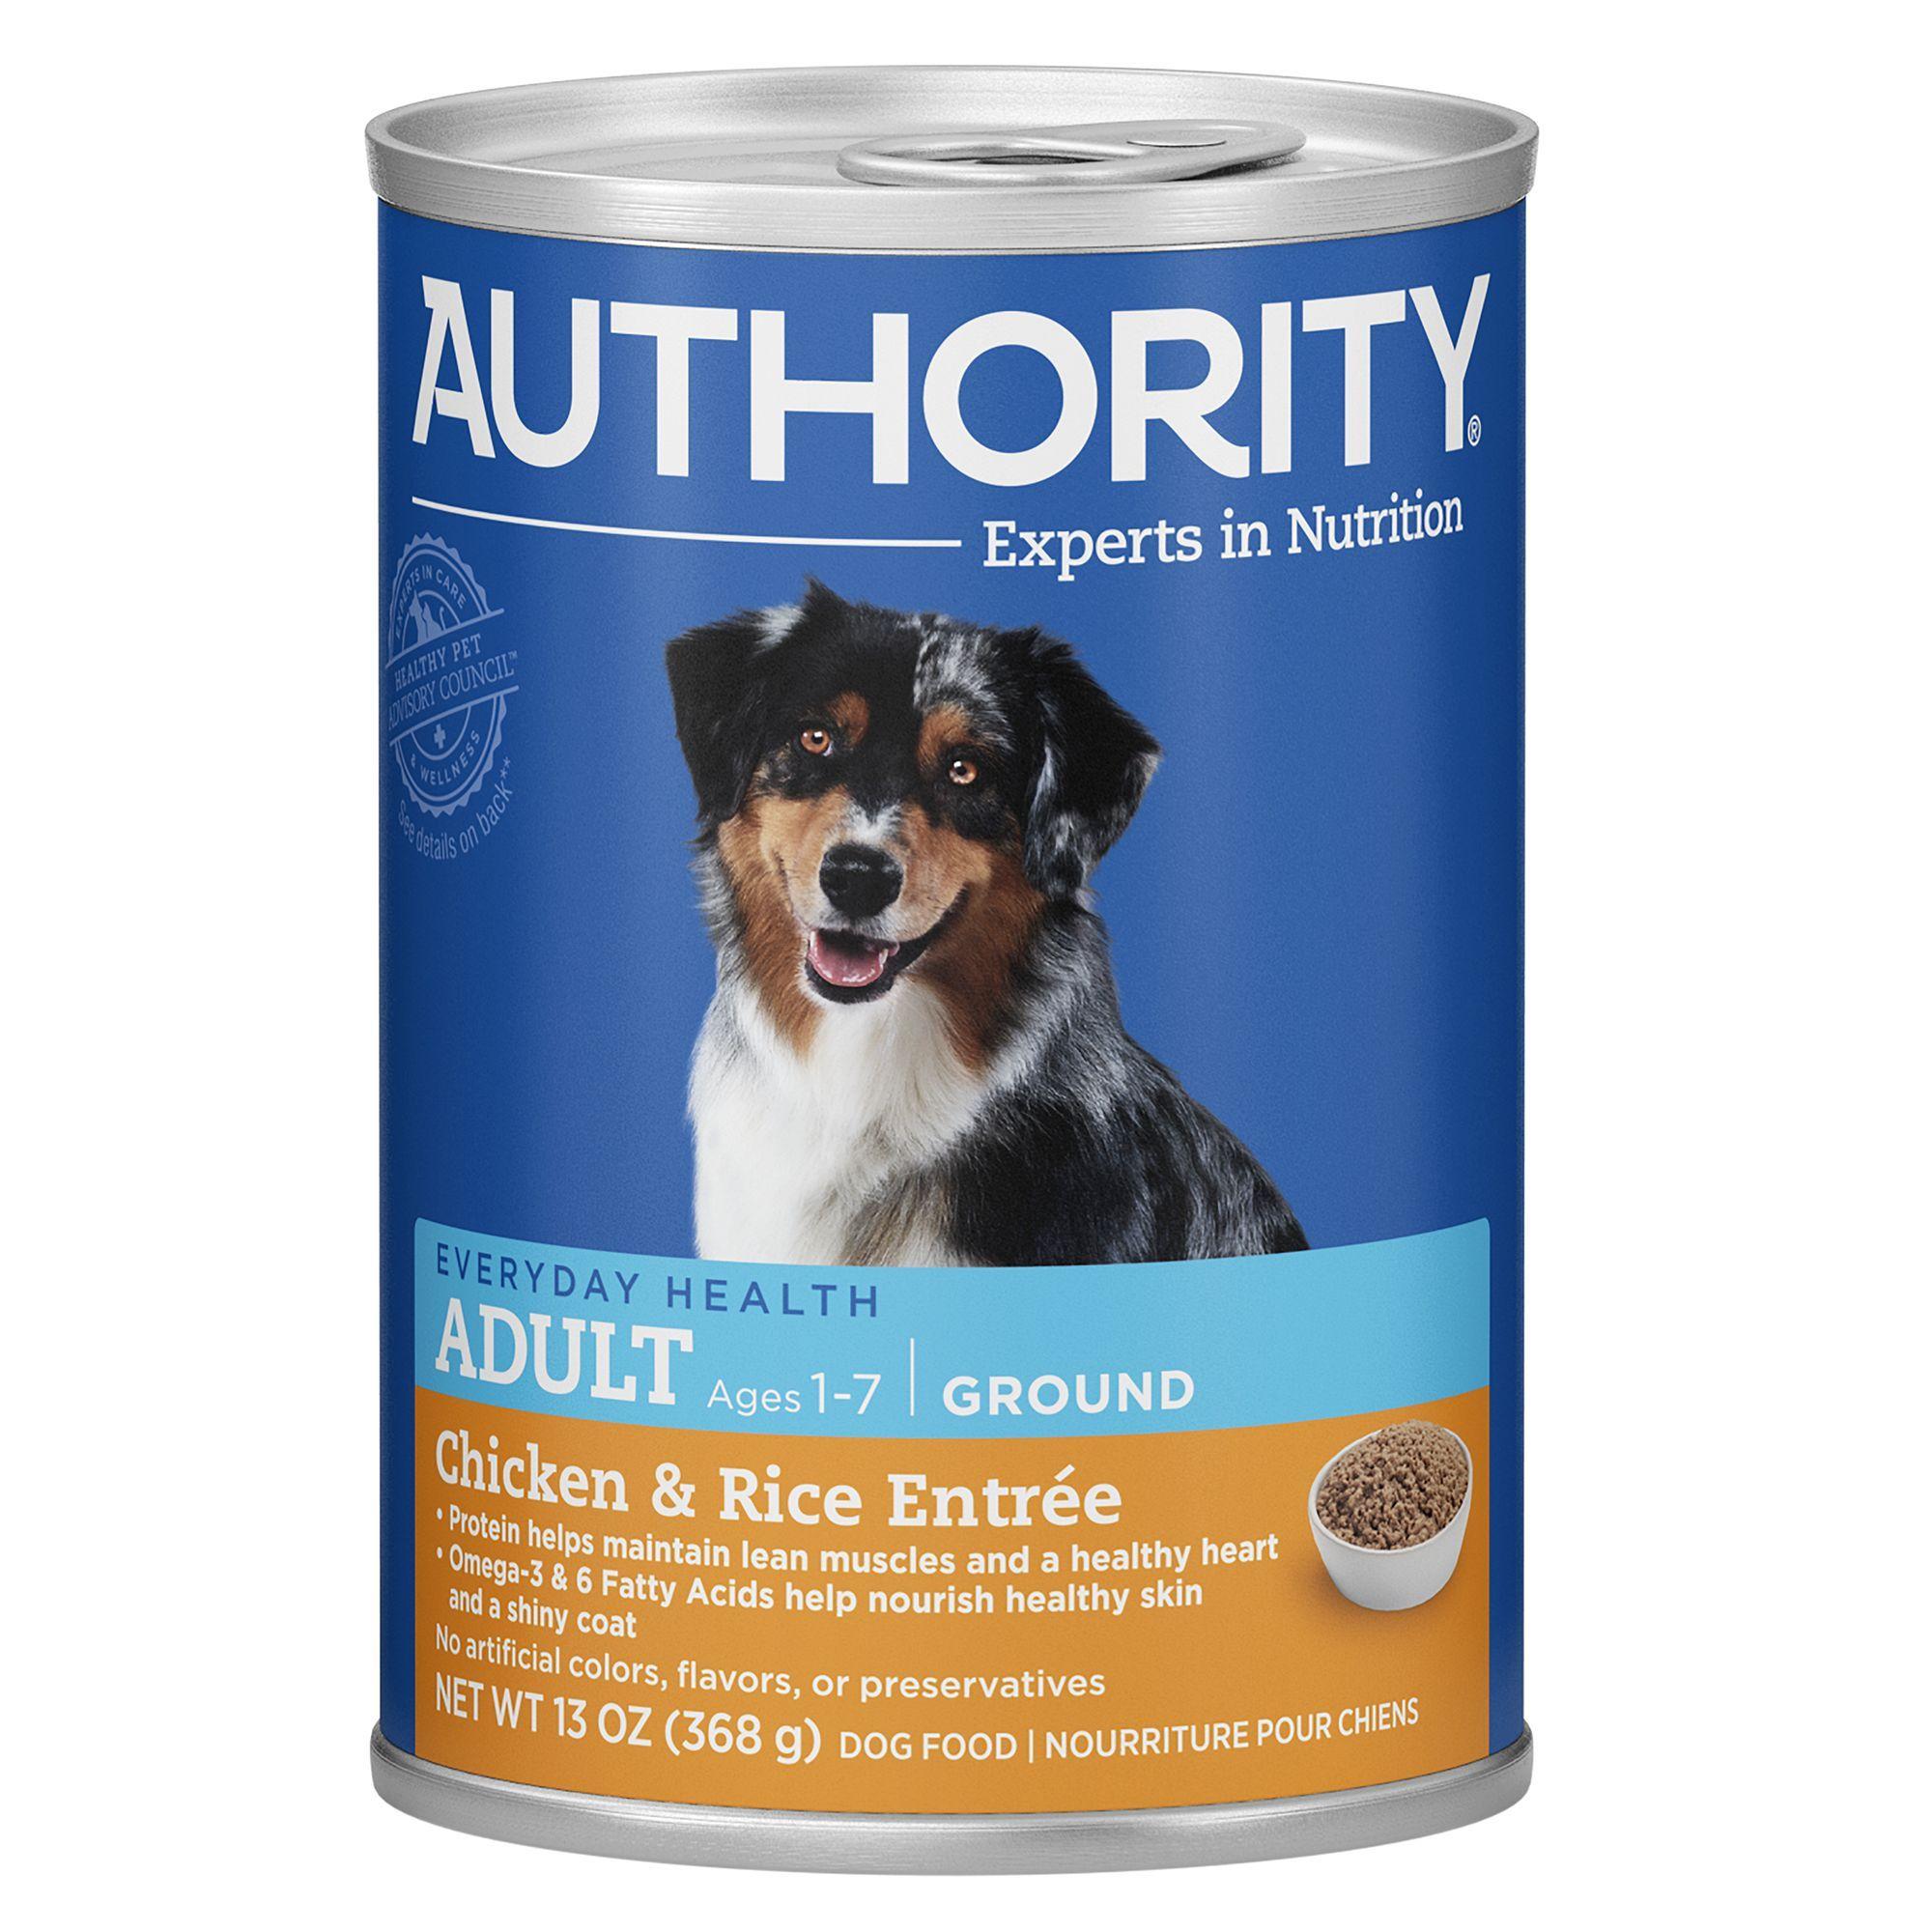 Authority Ground Entree Adult Wet Dog Food Size 13 Oz Beet